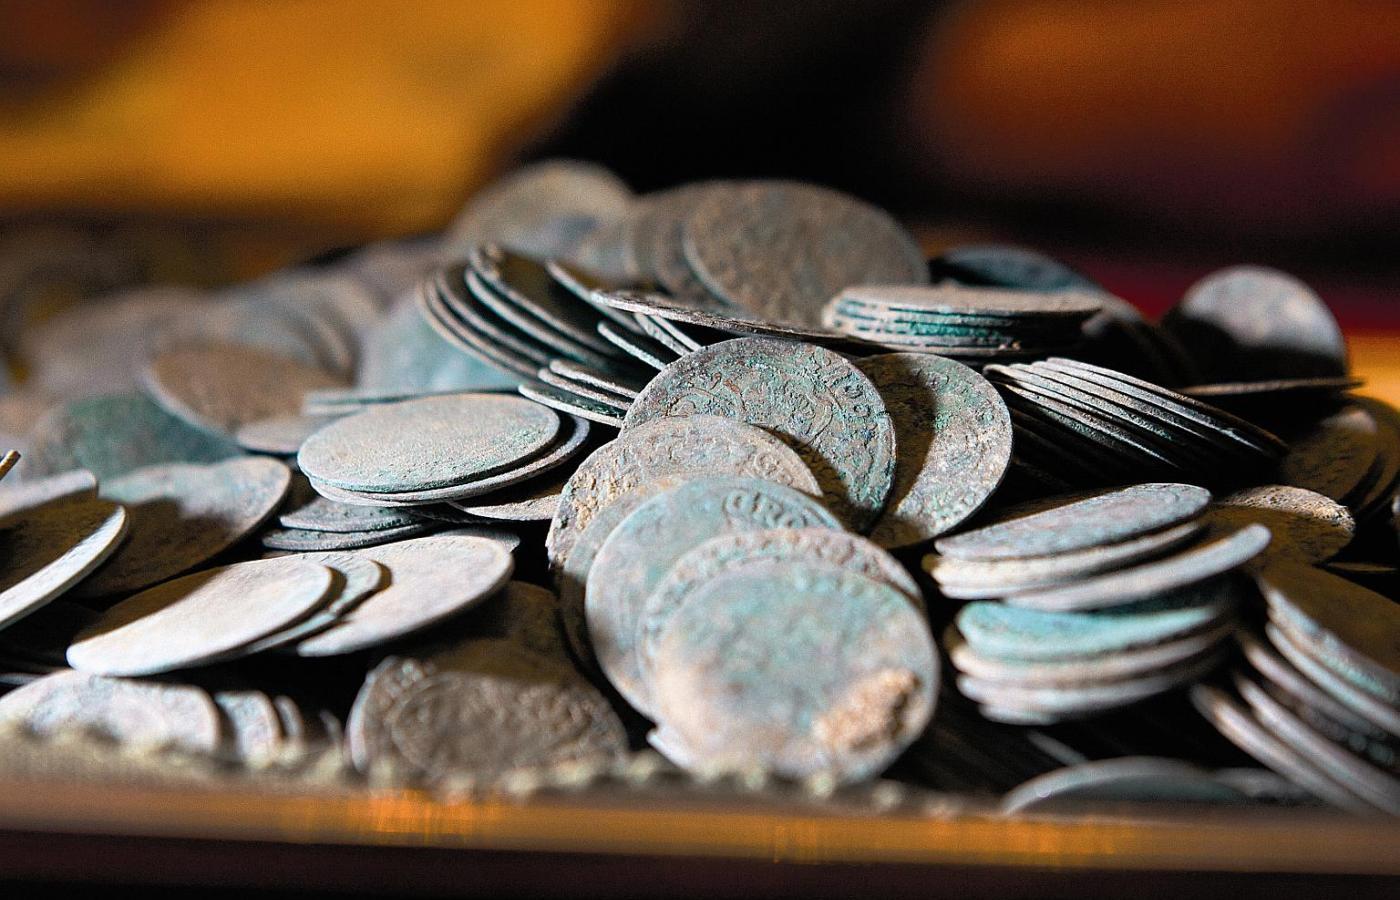 Datowanie biżuterii monet